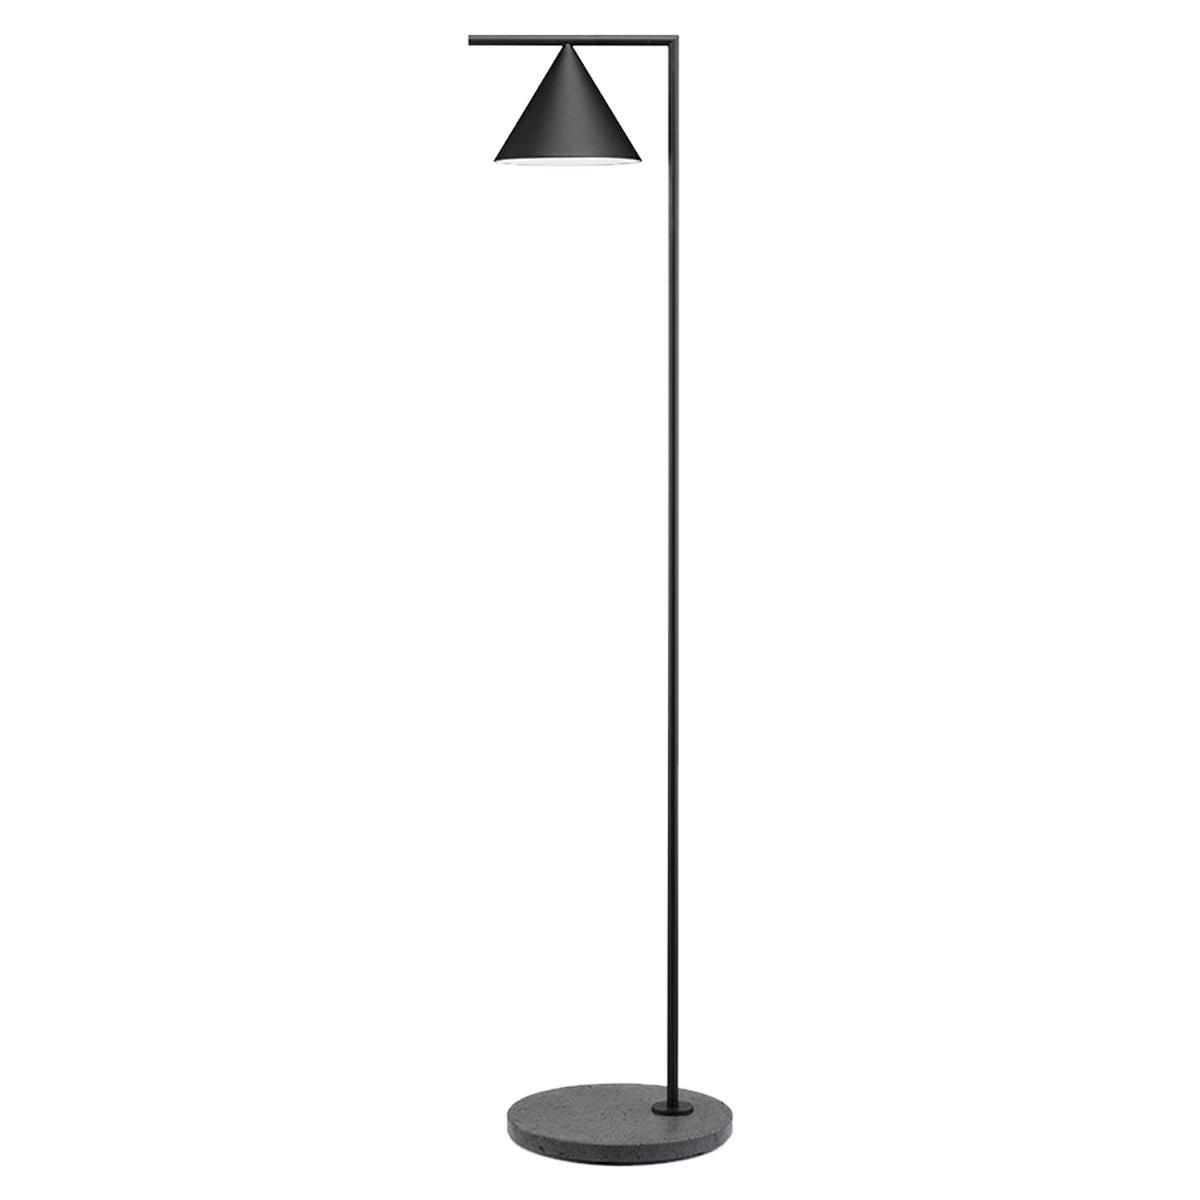 Flos Captain Flint 3000K Outdoor Floor Lamp by Michael Anastassiades